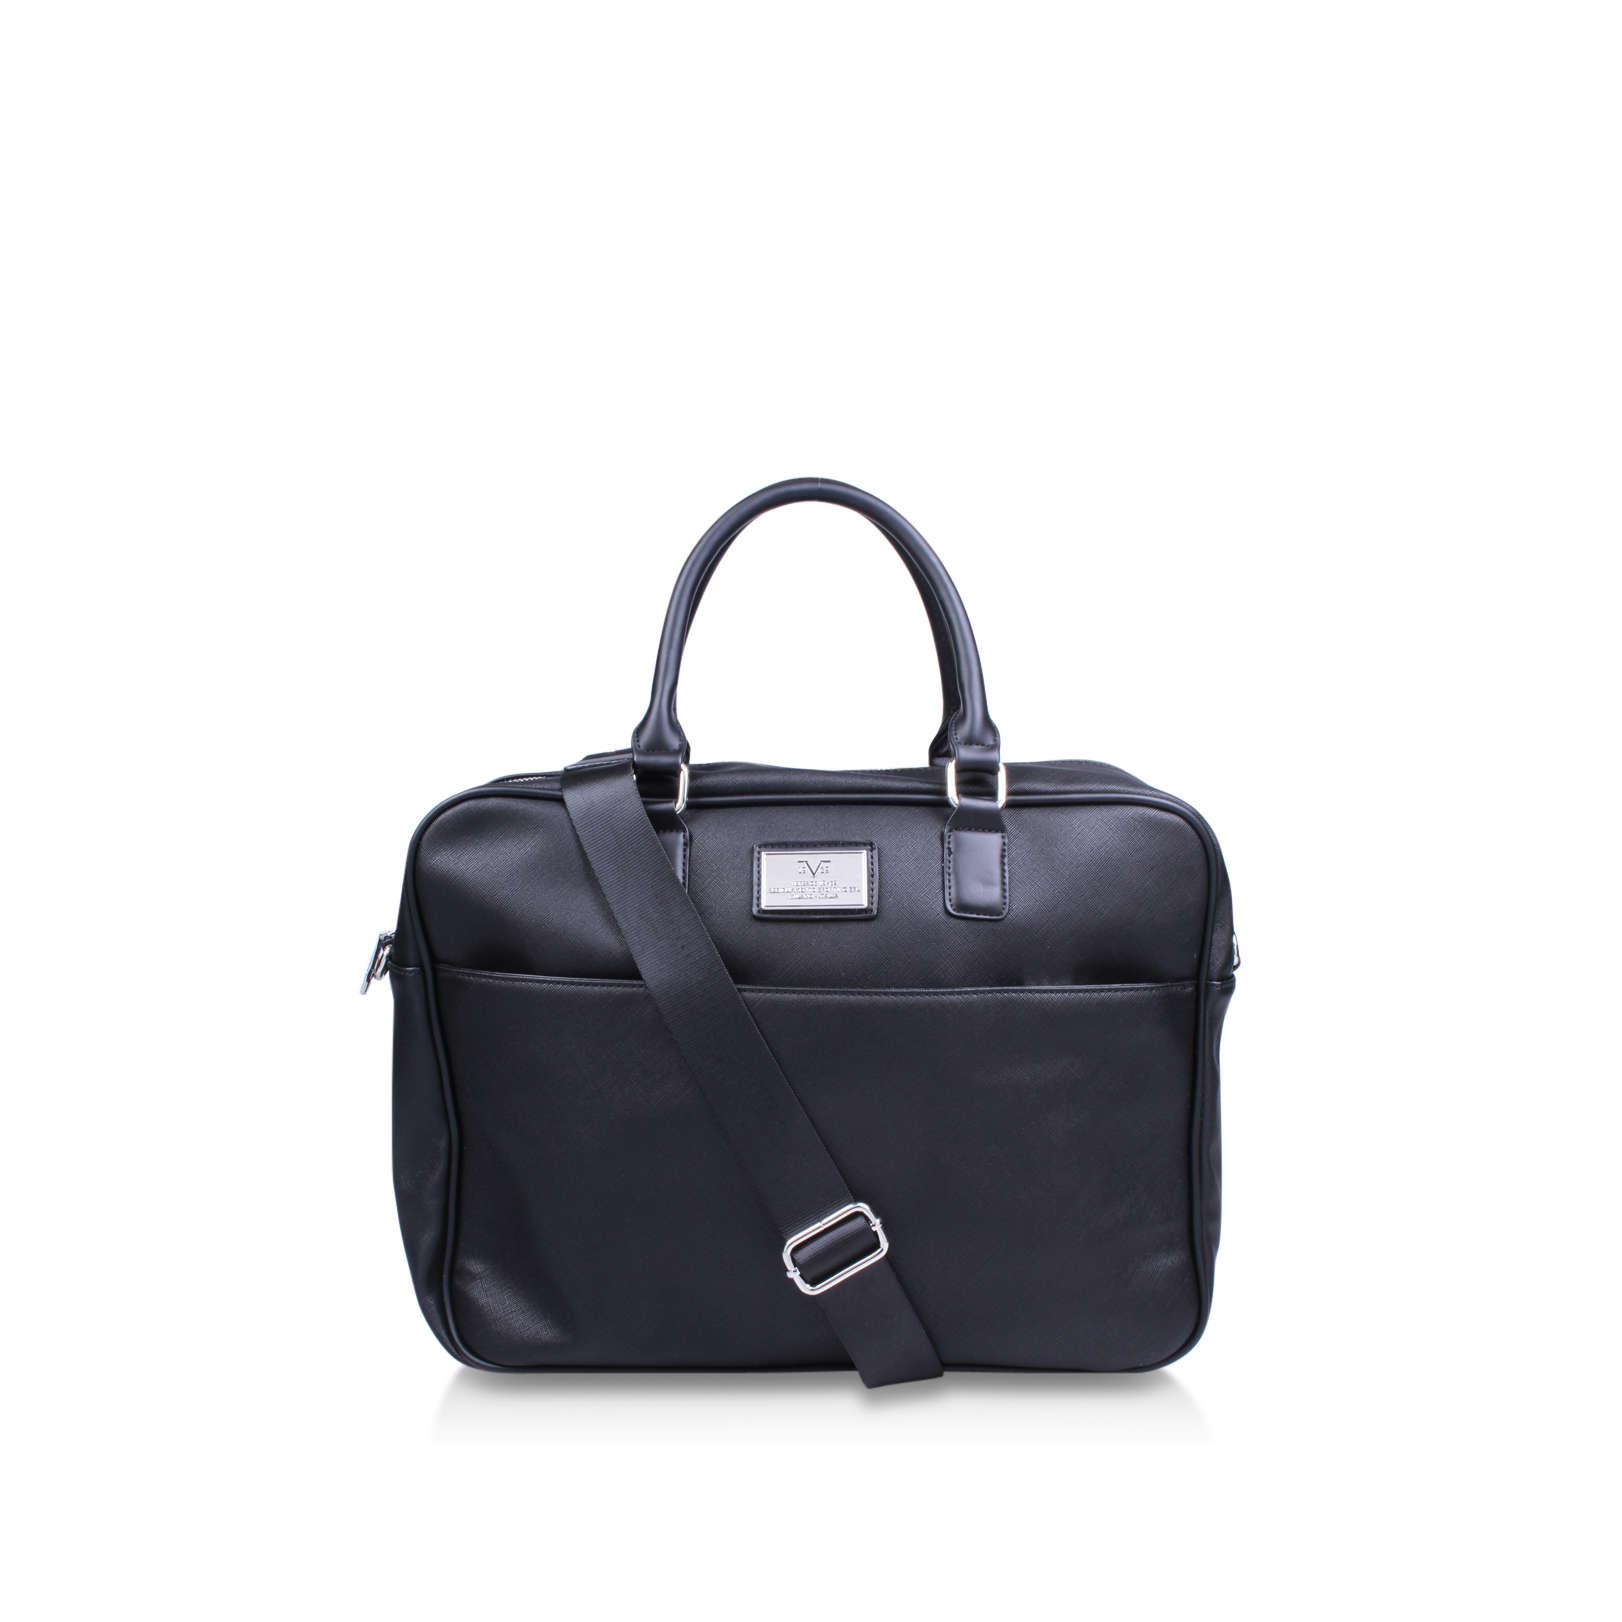 d0c94c9d5f57 Versace Newland in Black for Men - Lyst